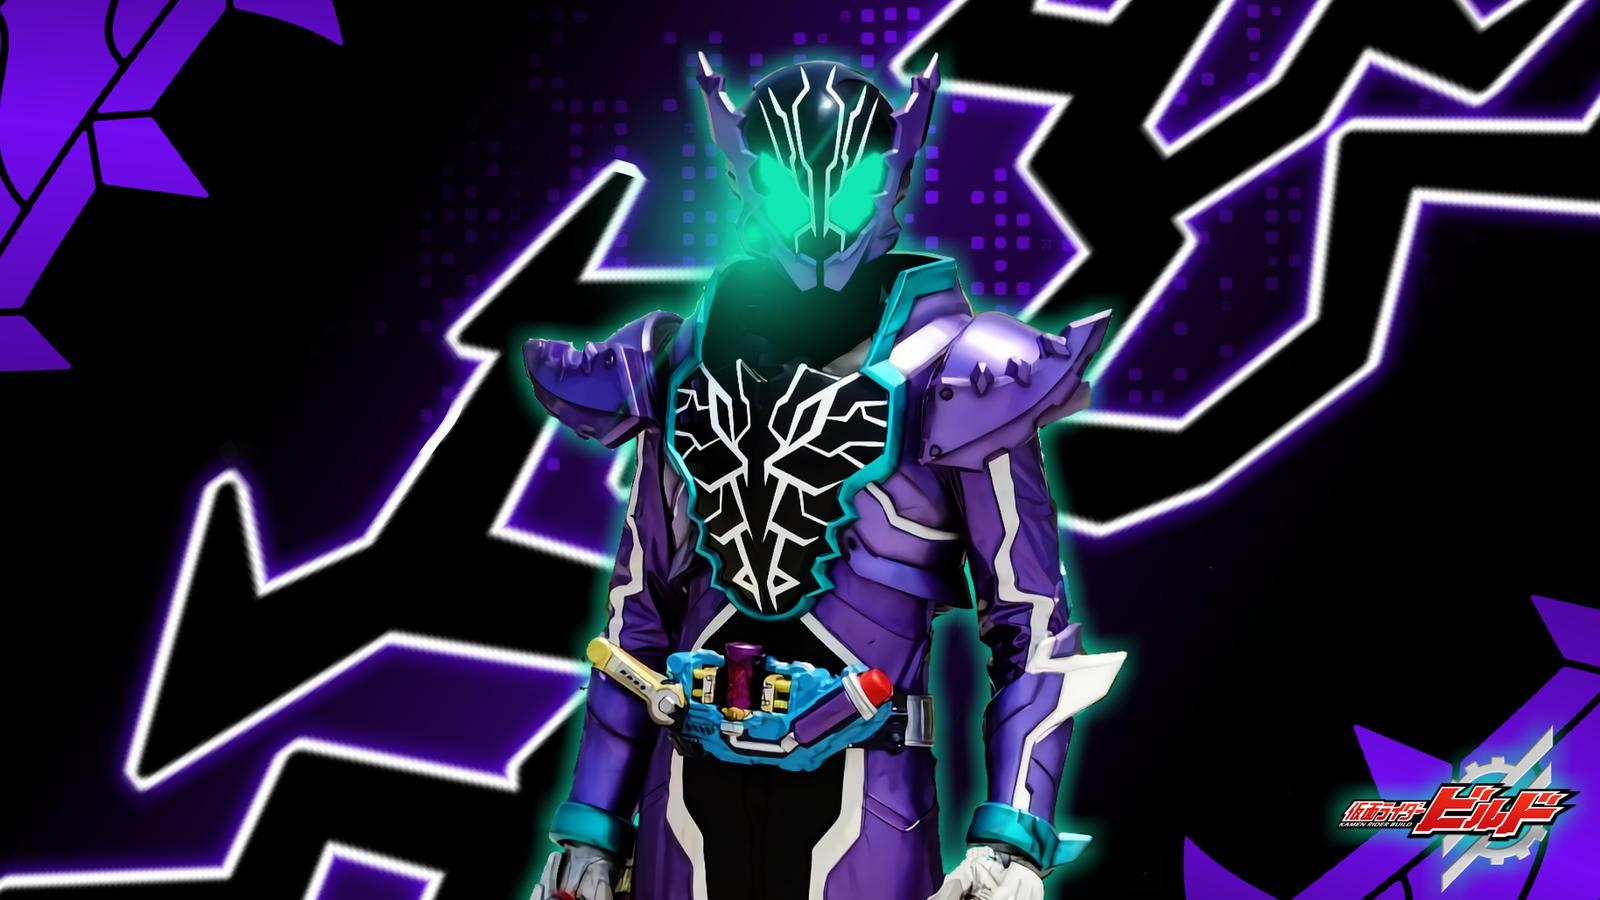 Kamen Rider Rogue Wallpaper By Sekairider By Sekairider Ddu9two Fullview